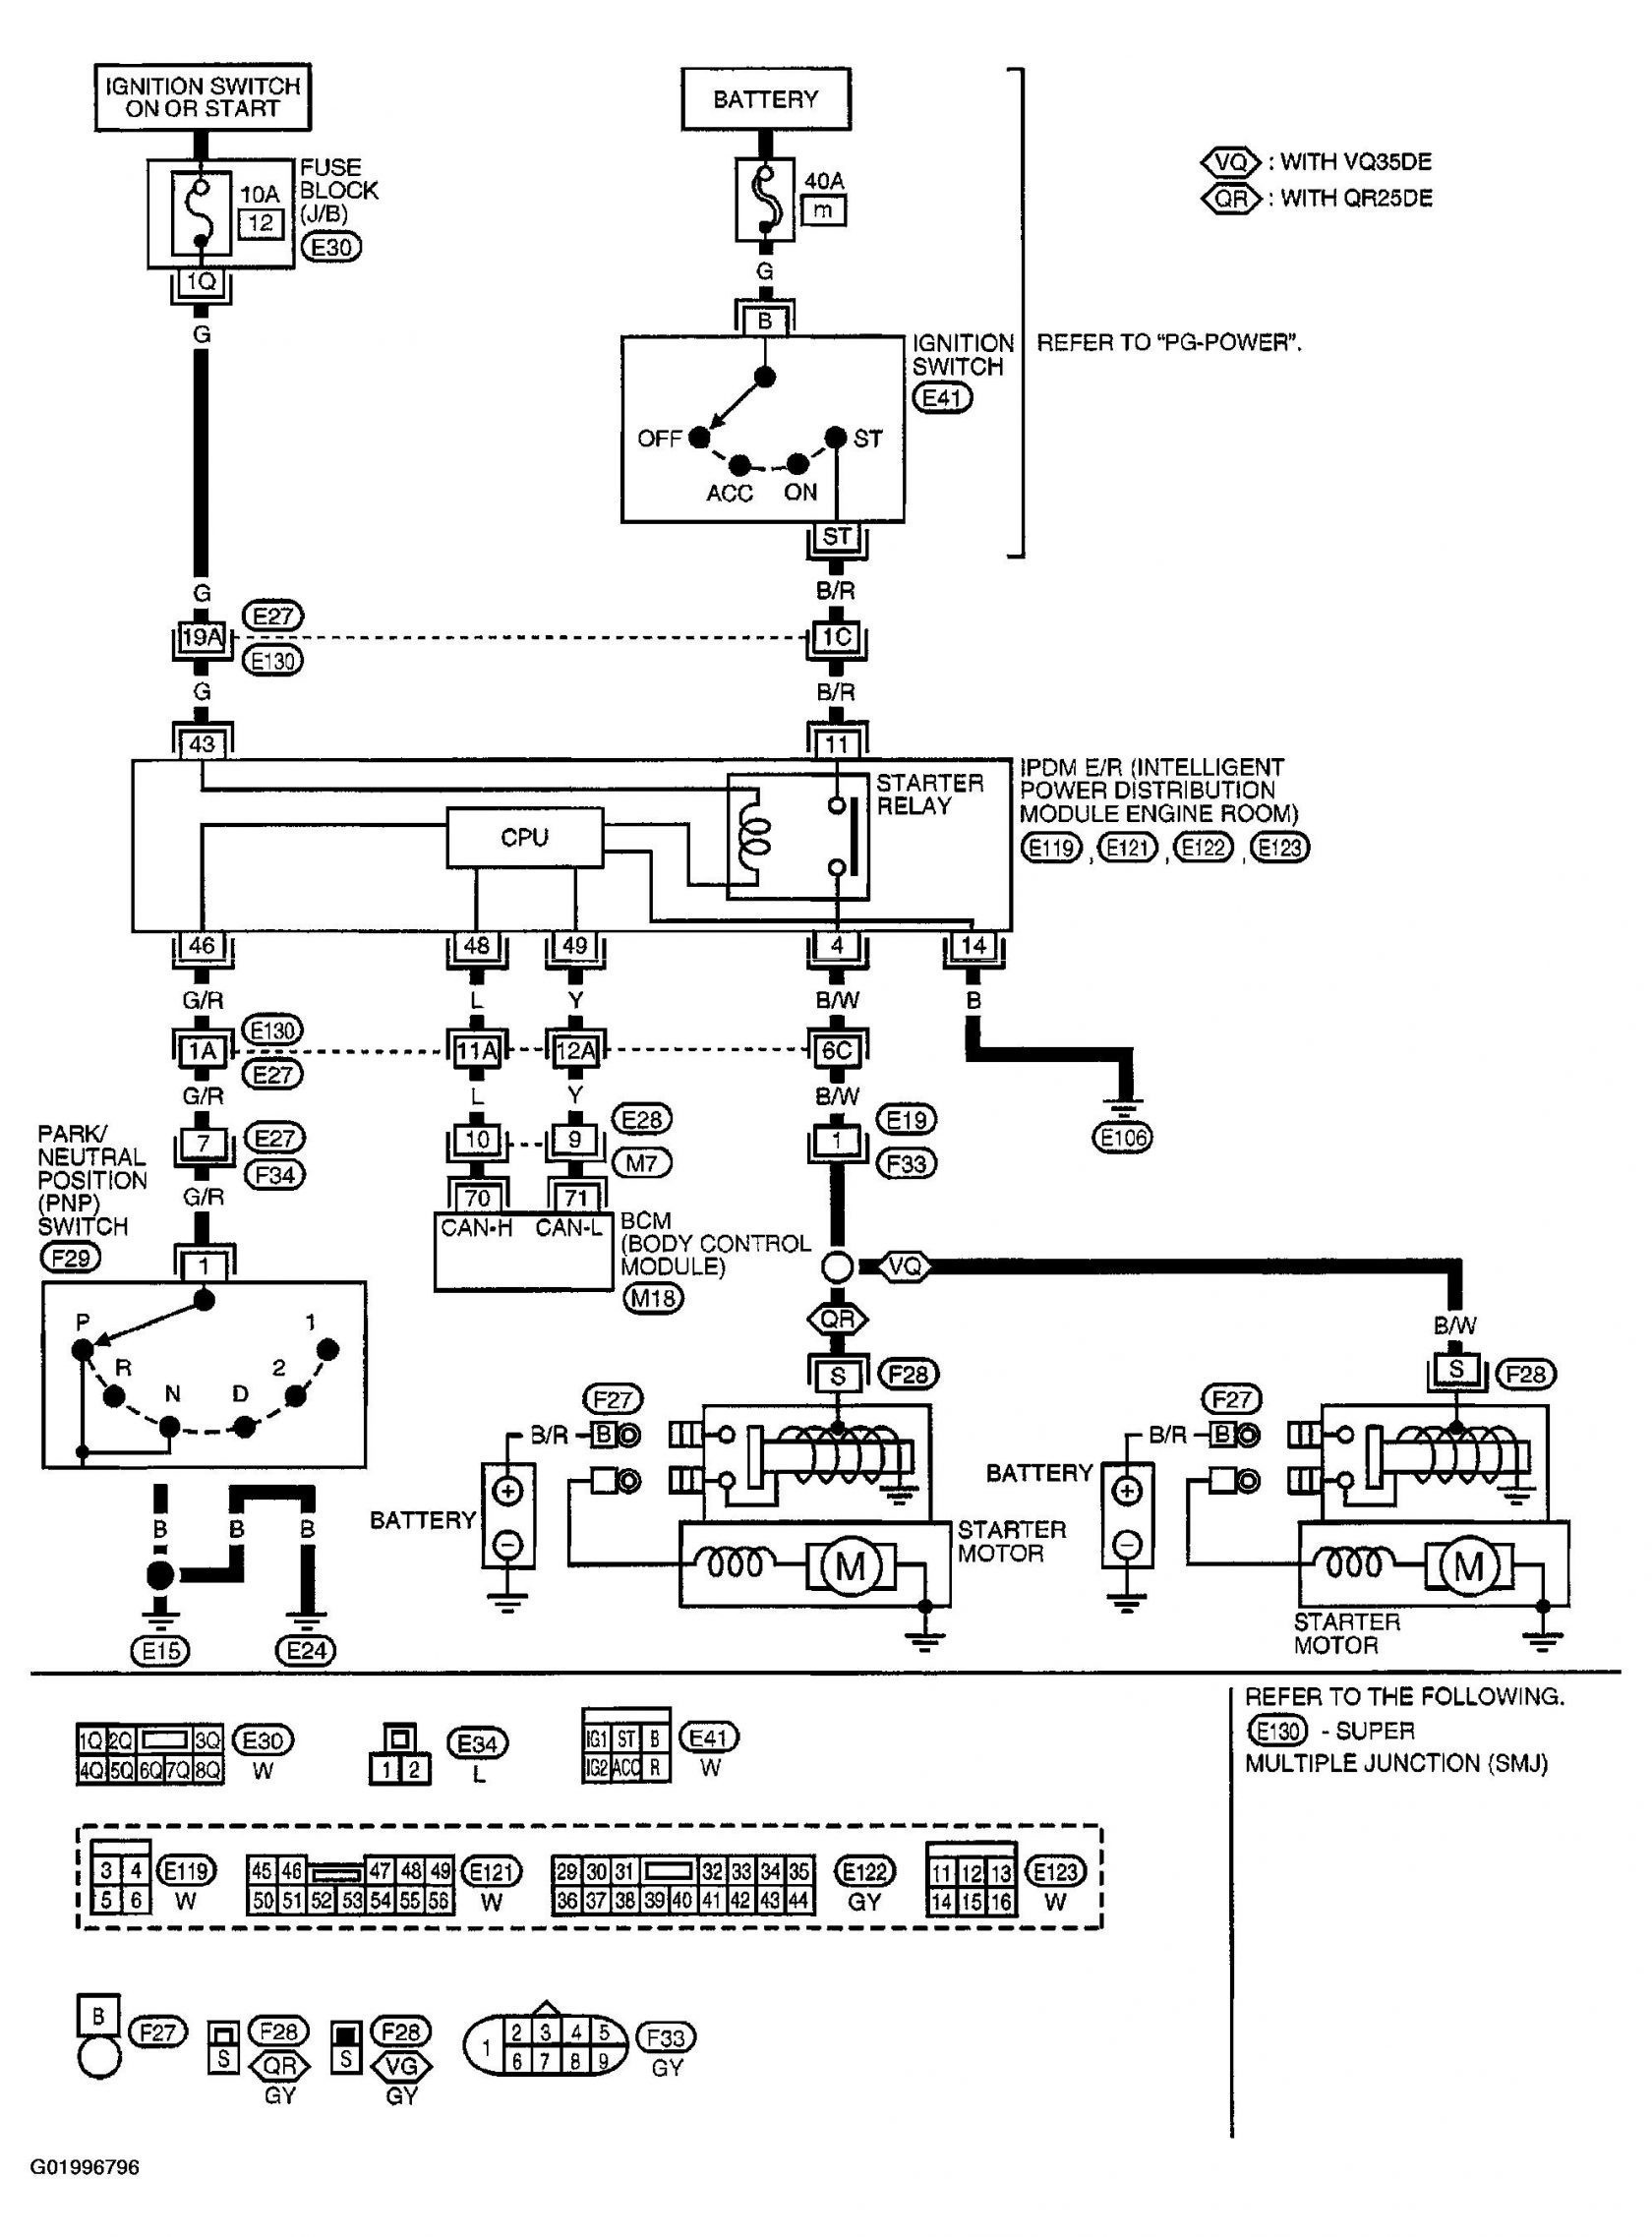 2002 Nissan Pathfinder Engine Diagram 2002 Nissan Xterra ... on